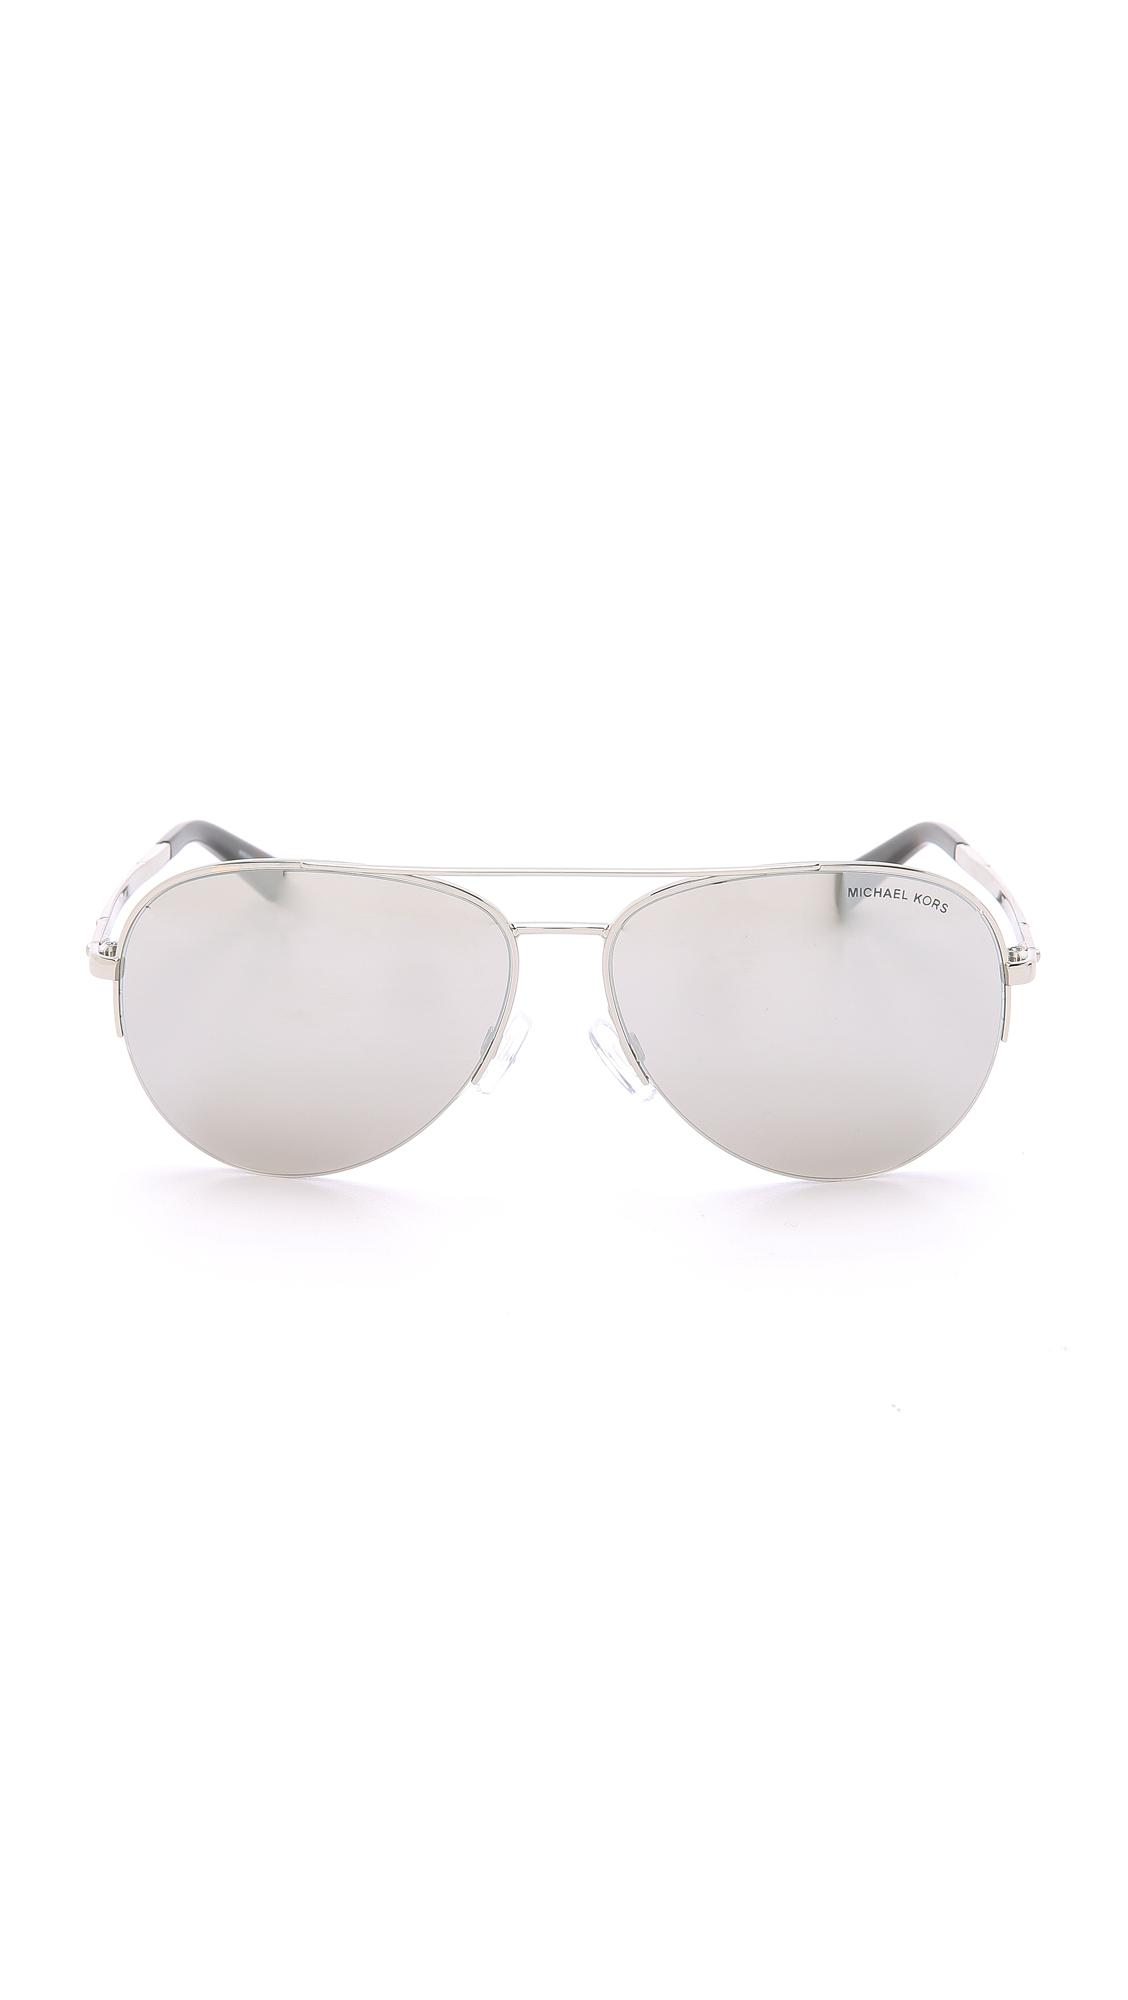 52338071bc5 Michael Kors Gramercy Sunglasses